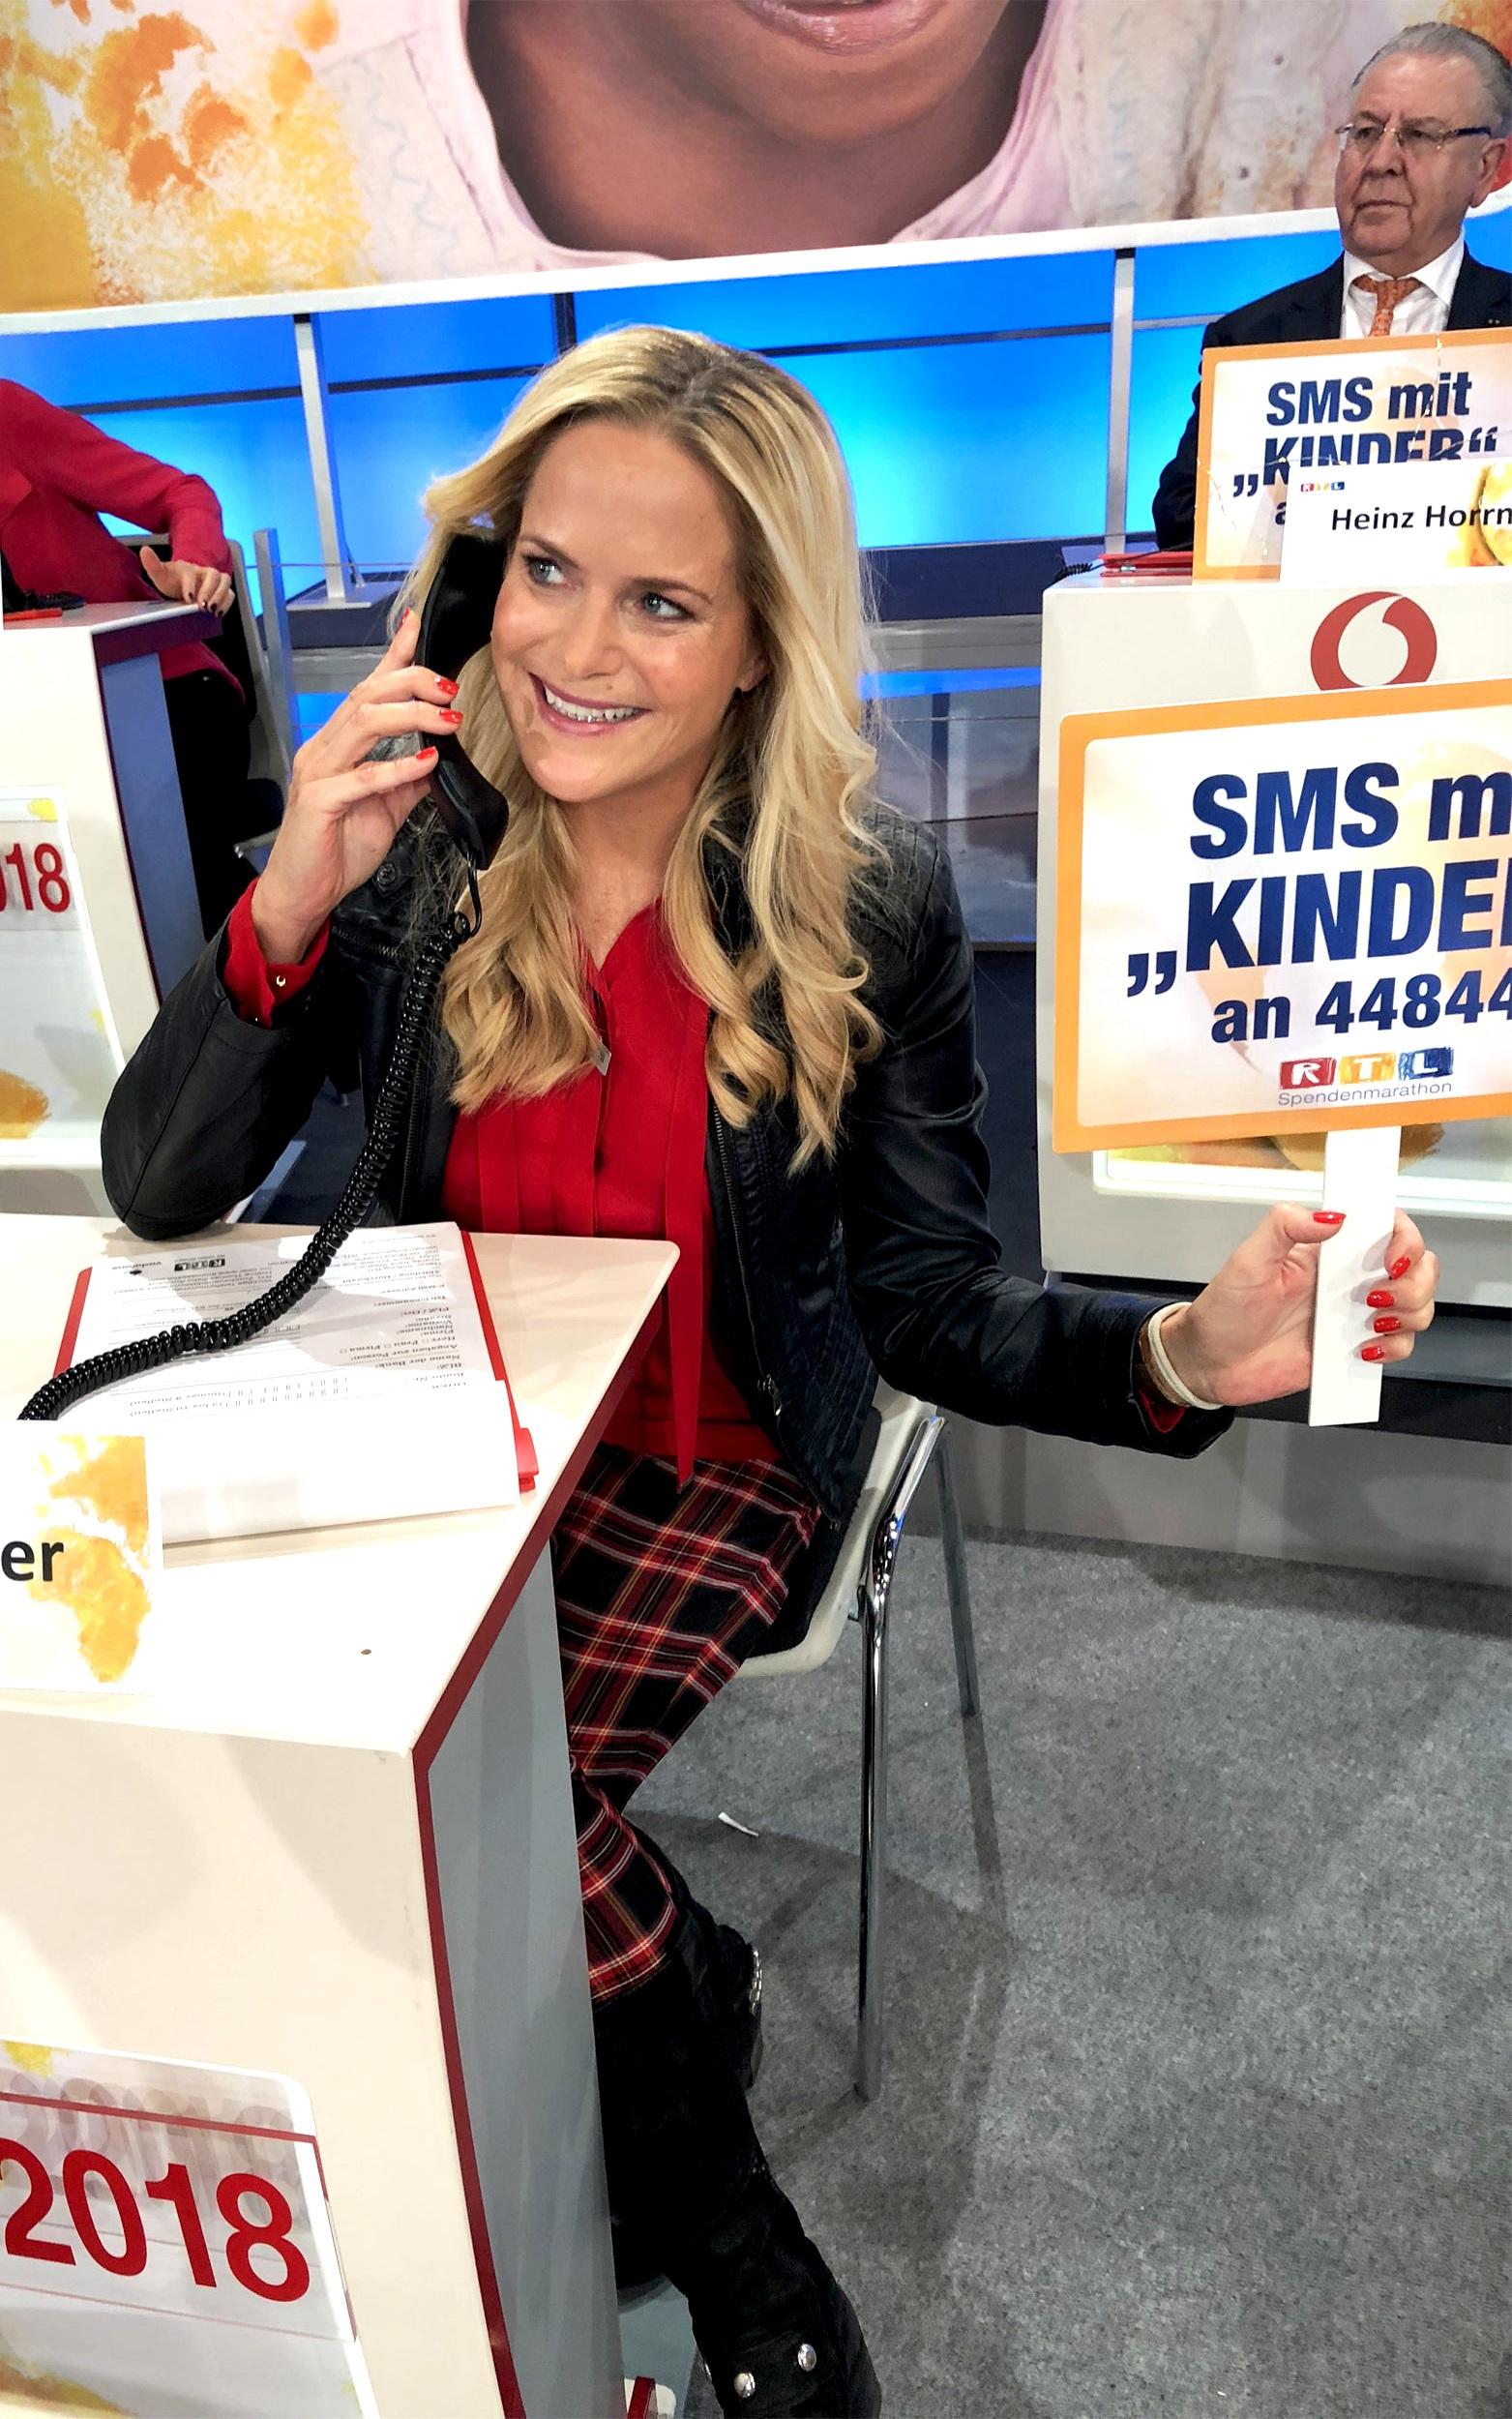 kinder_helfen_rtl_anruf.jpg